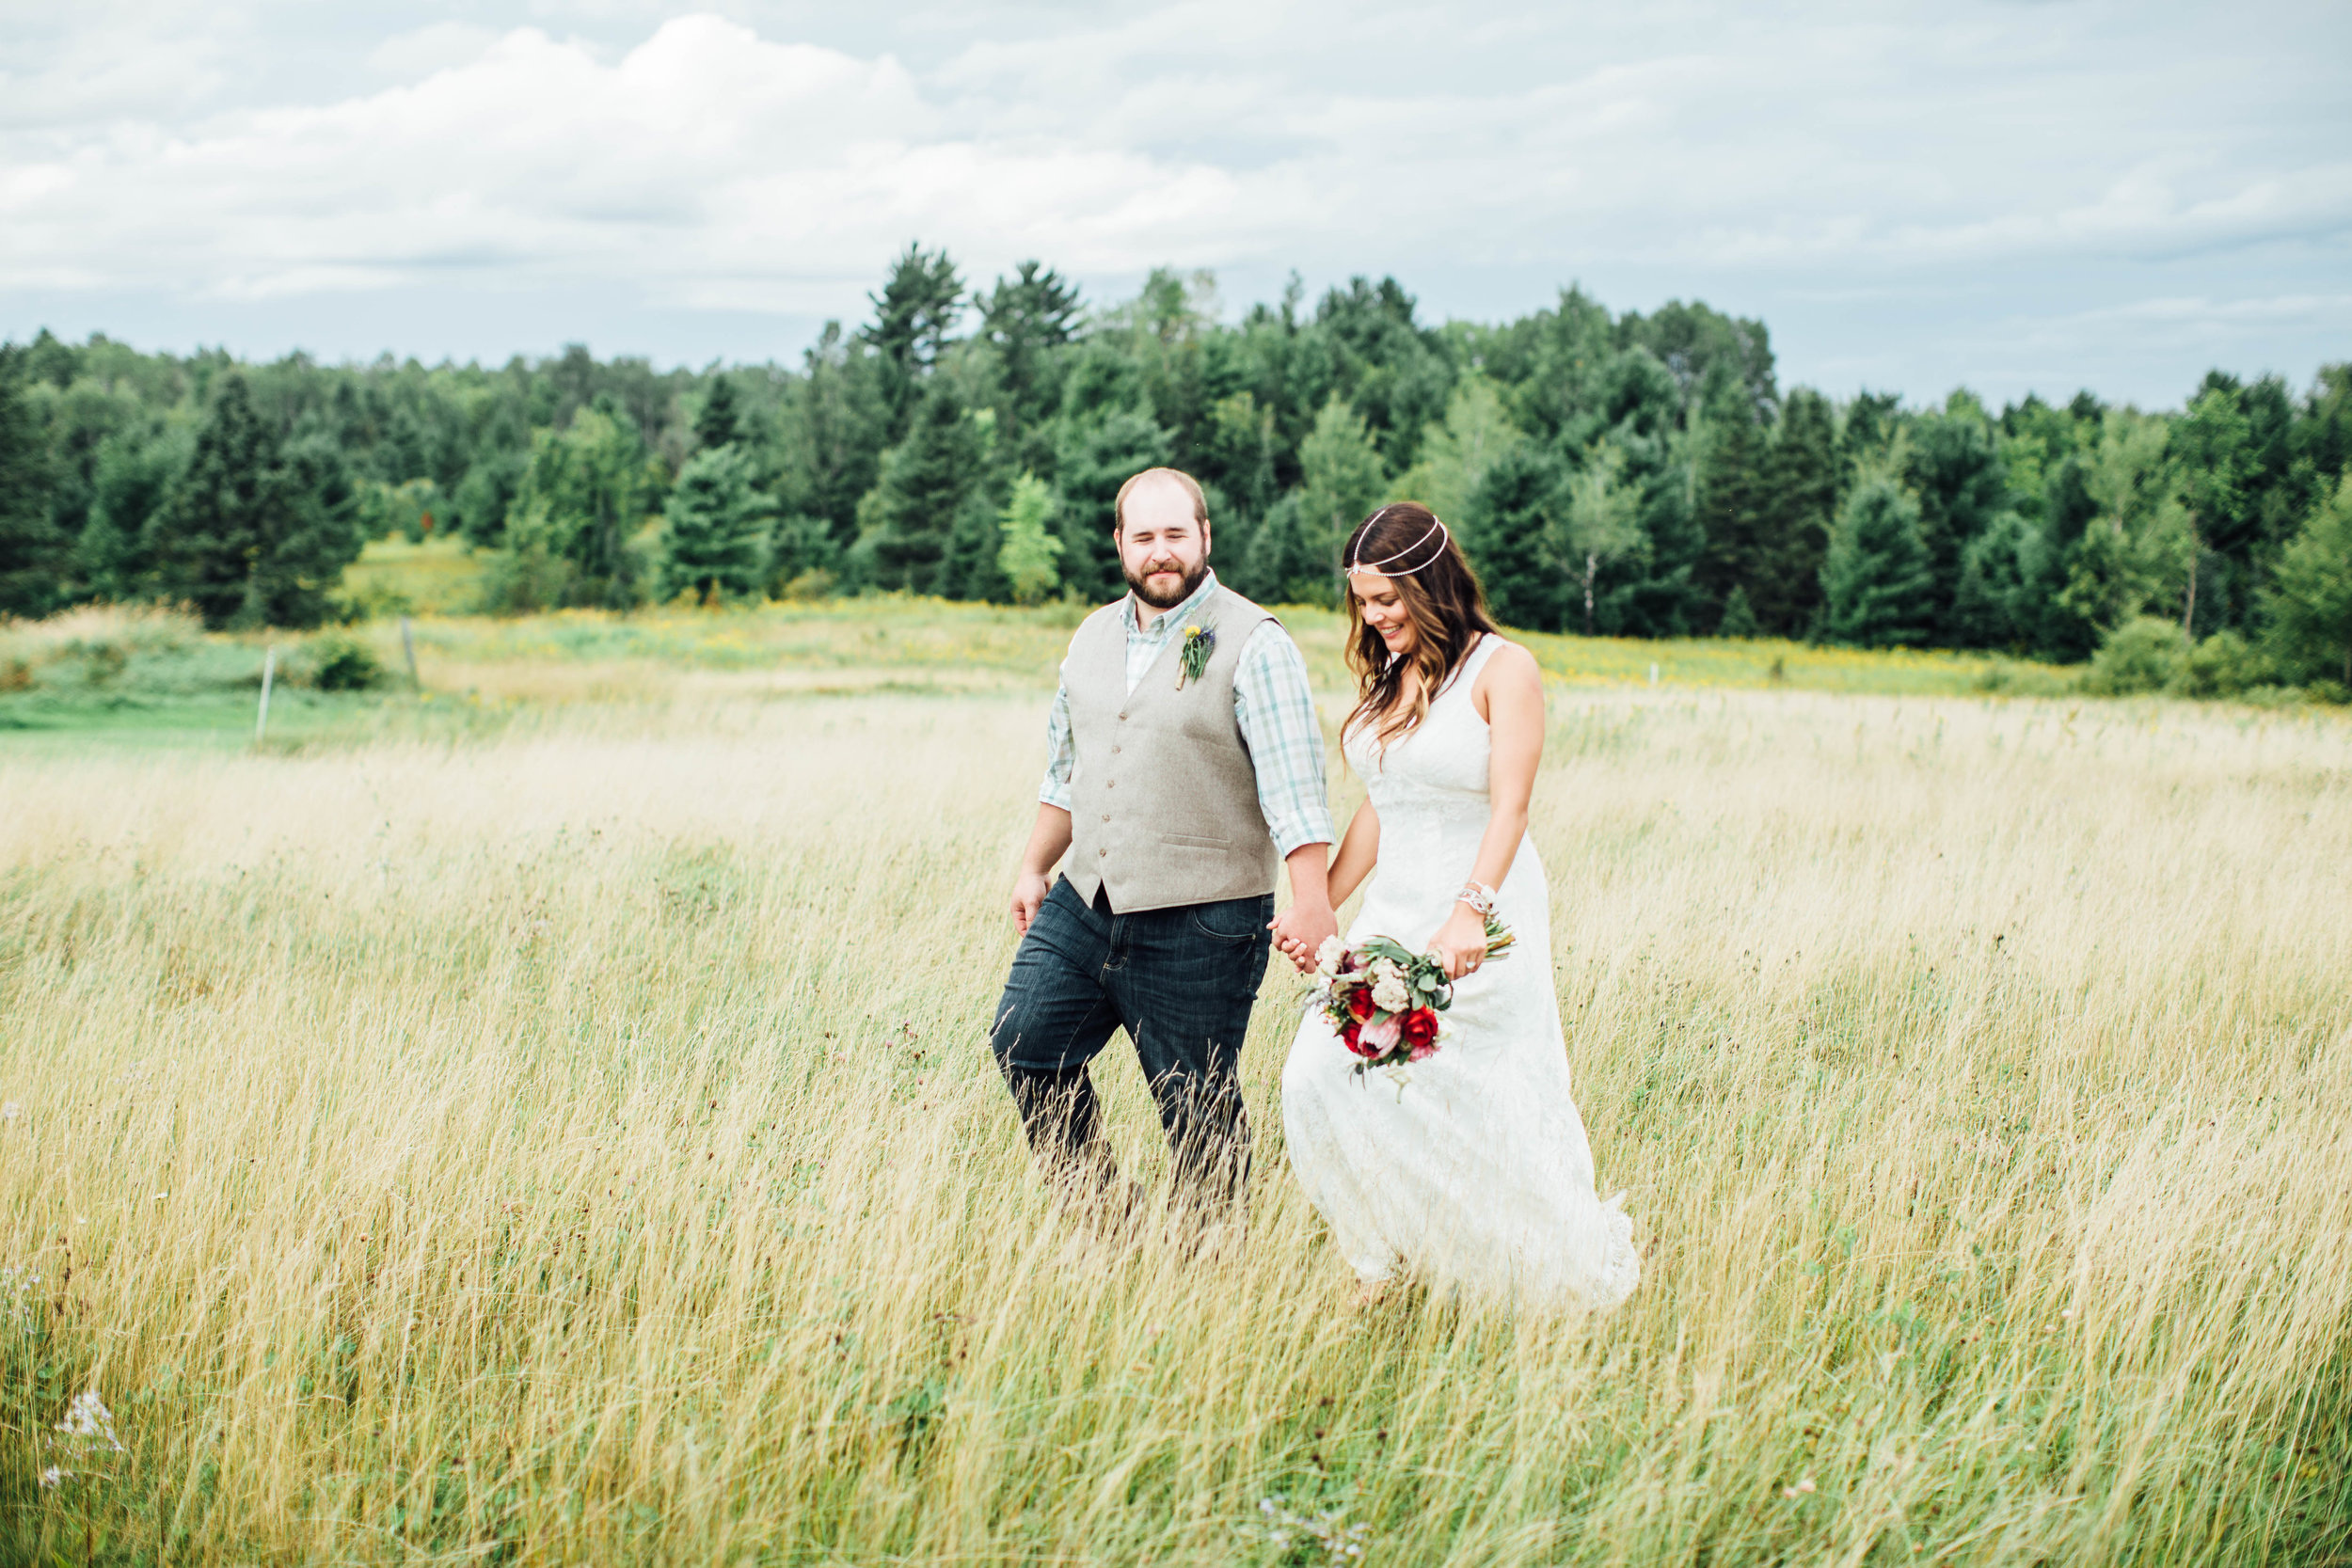 Bohemian Wedding - Sabrina Leigh Studios - Northern Michigan Wedding Photographer078.jpg